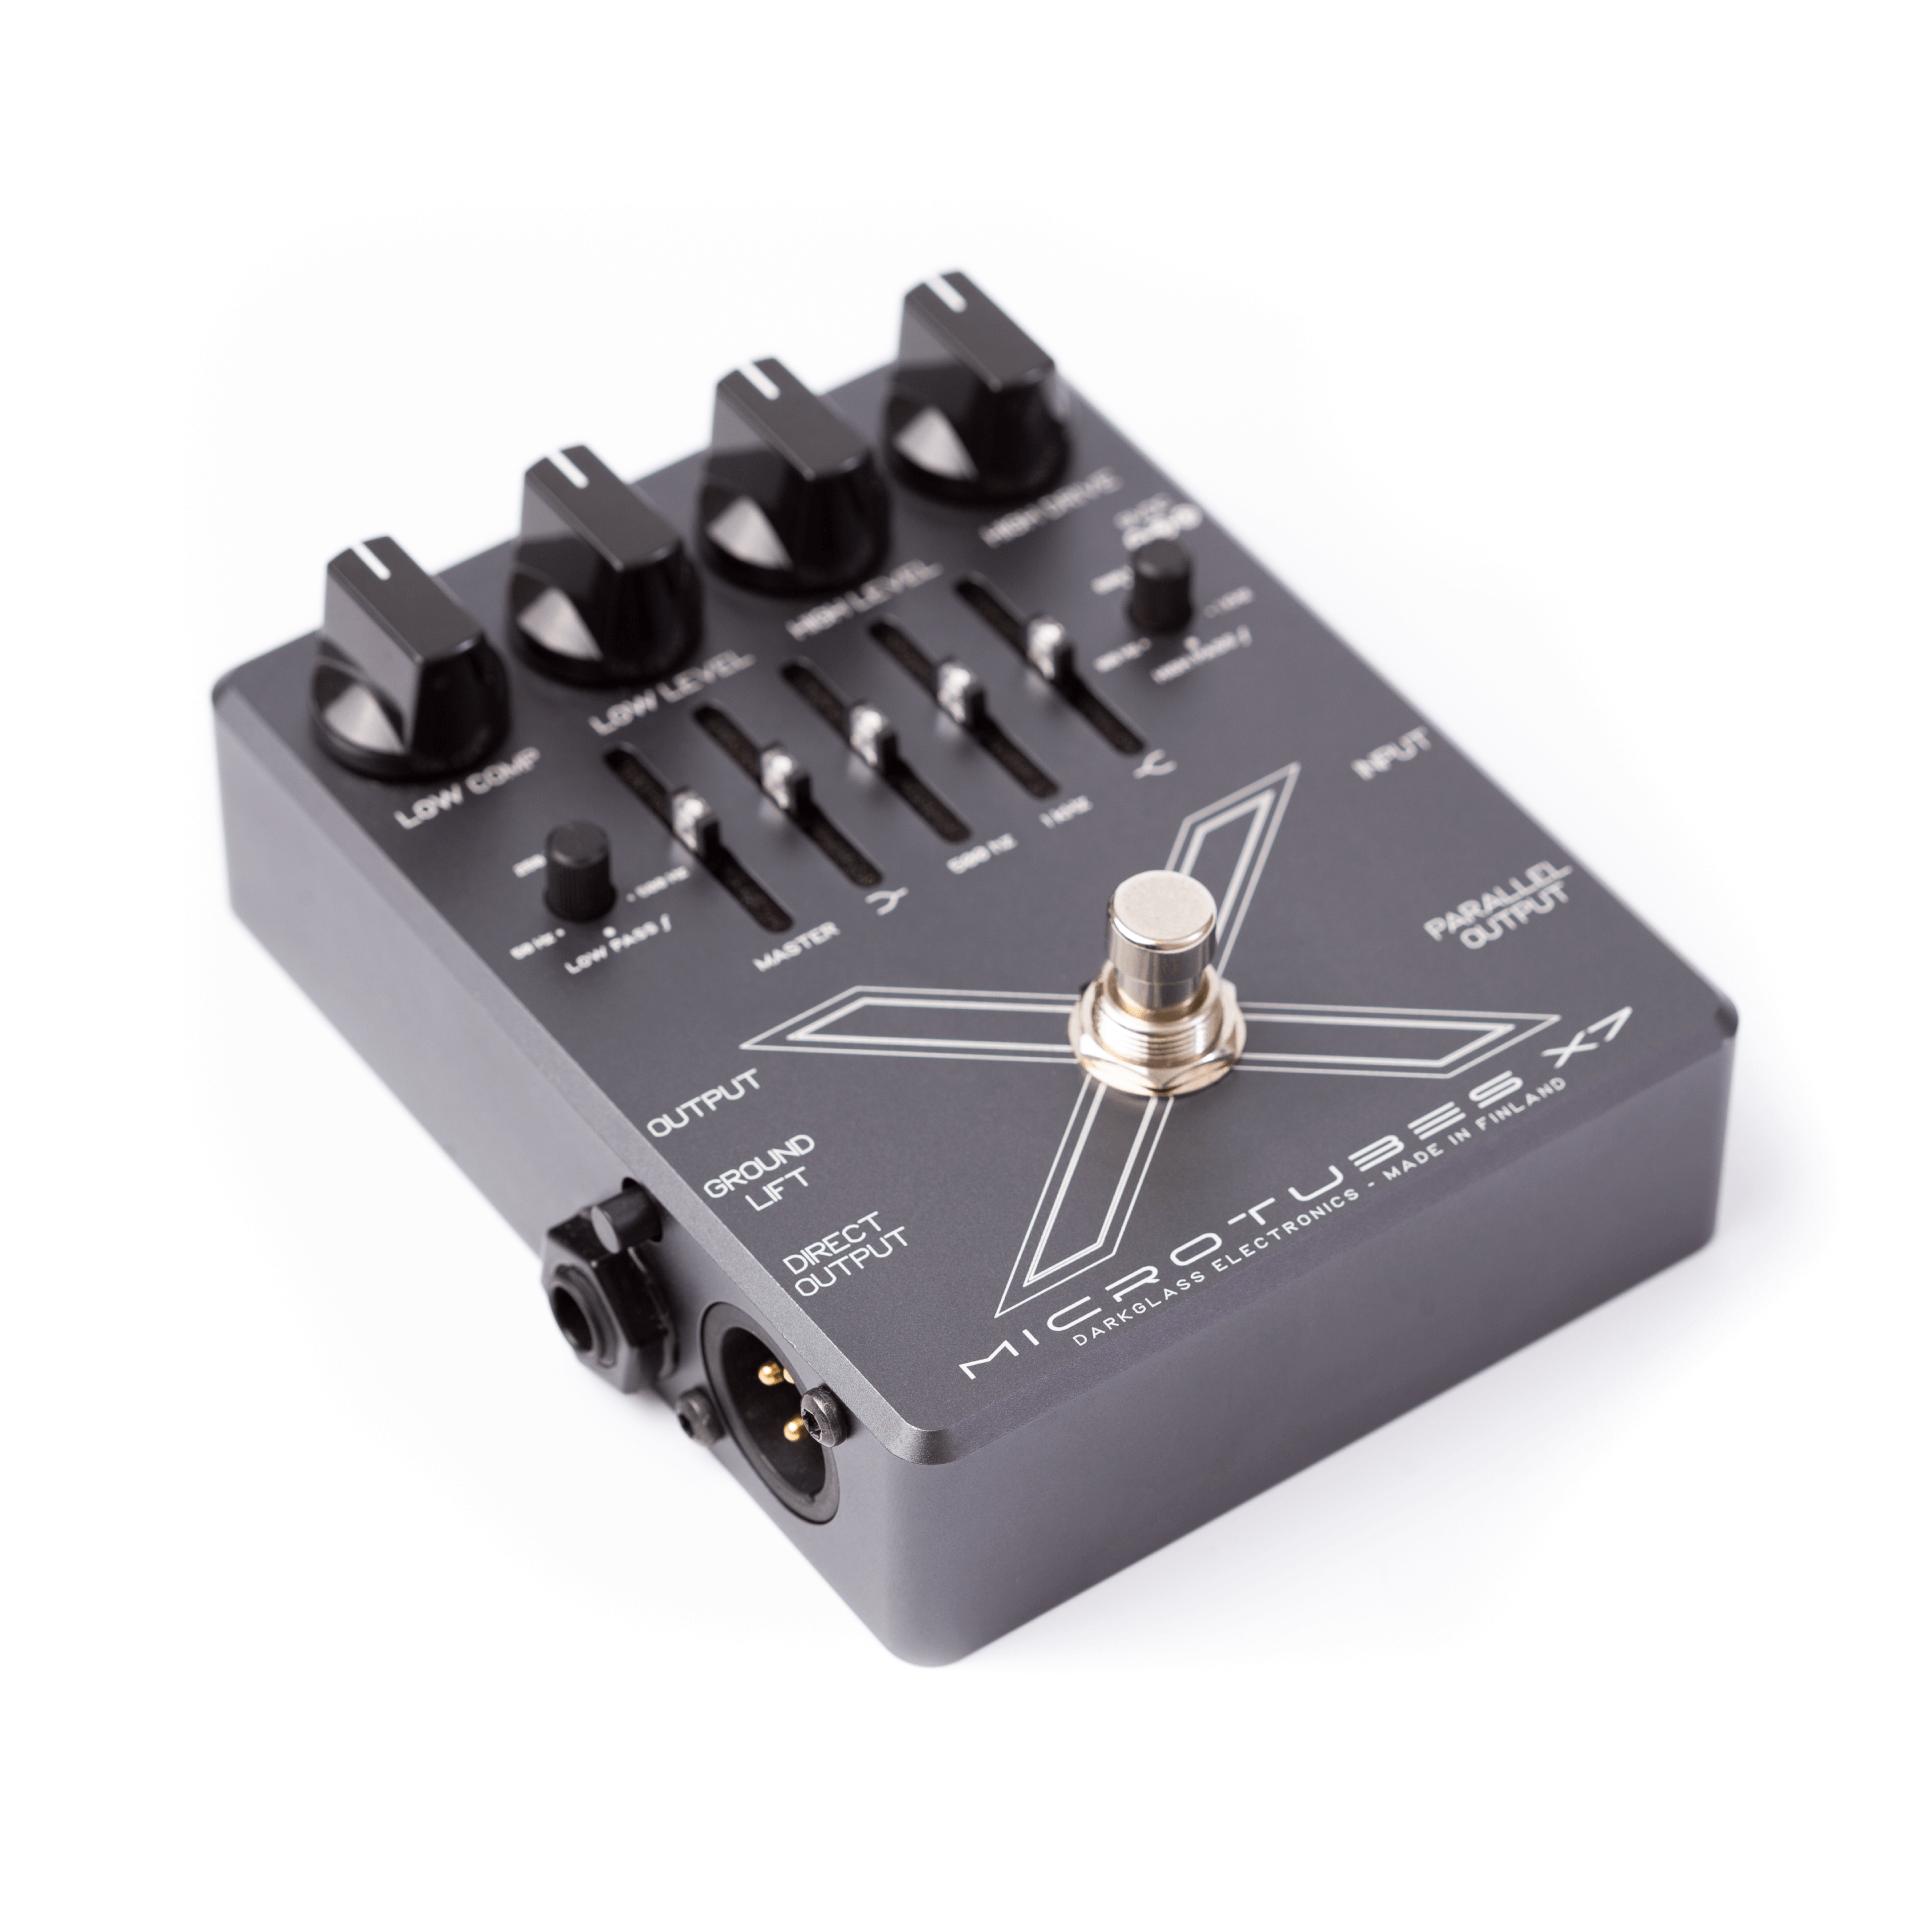 Darkglass Microtubes X7 Bass Preamp Distortion Pedal